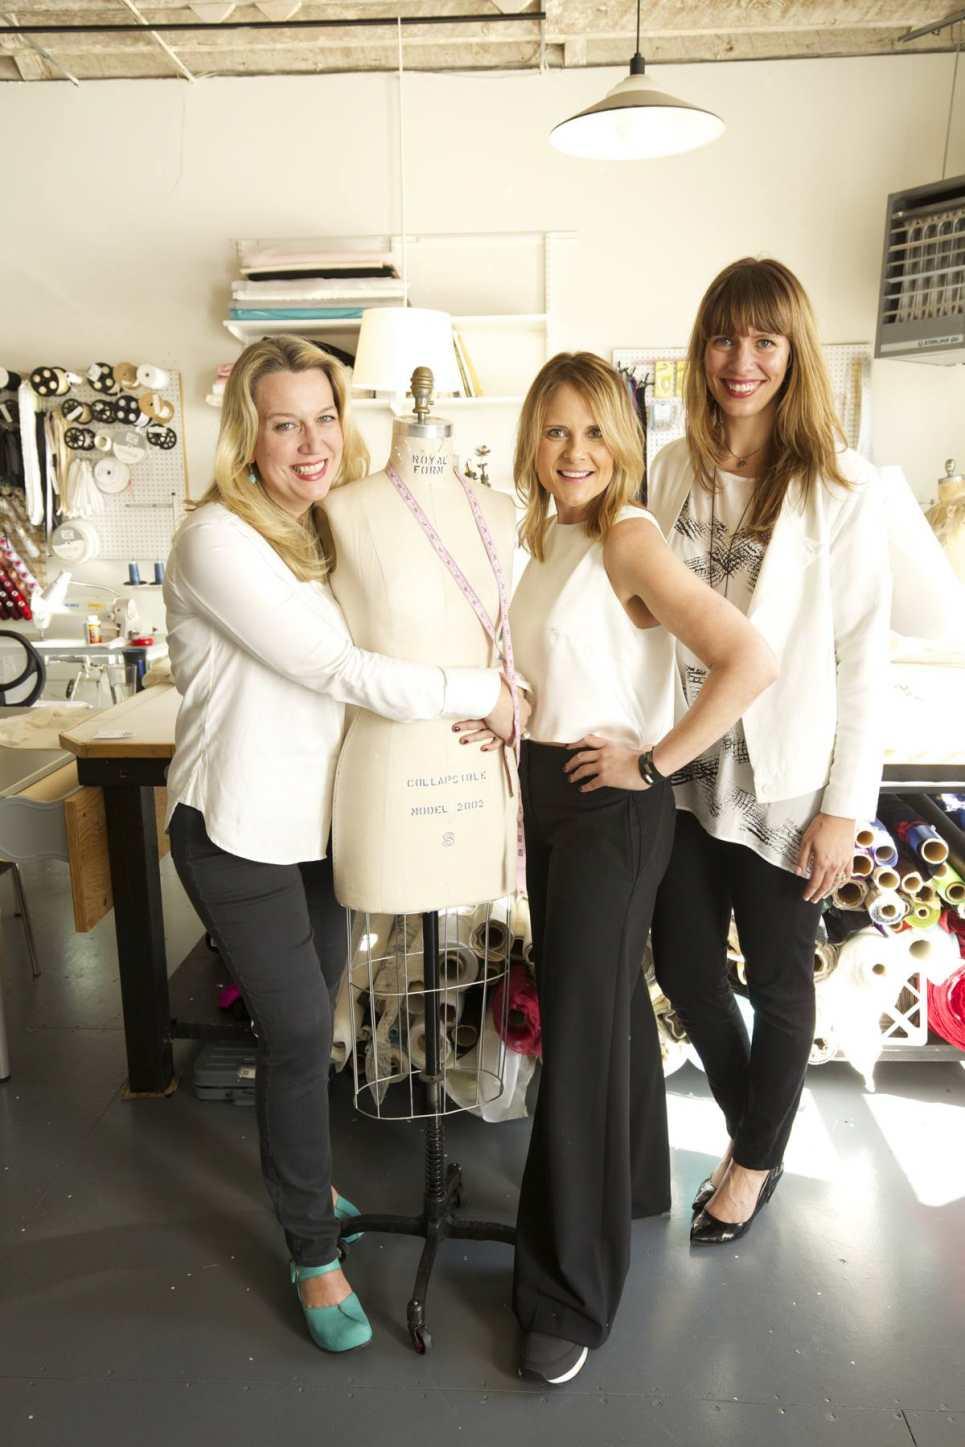 Pictured DeCourcy, Cheryl Strayed, Scarlett Chamberlin